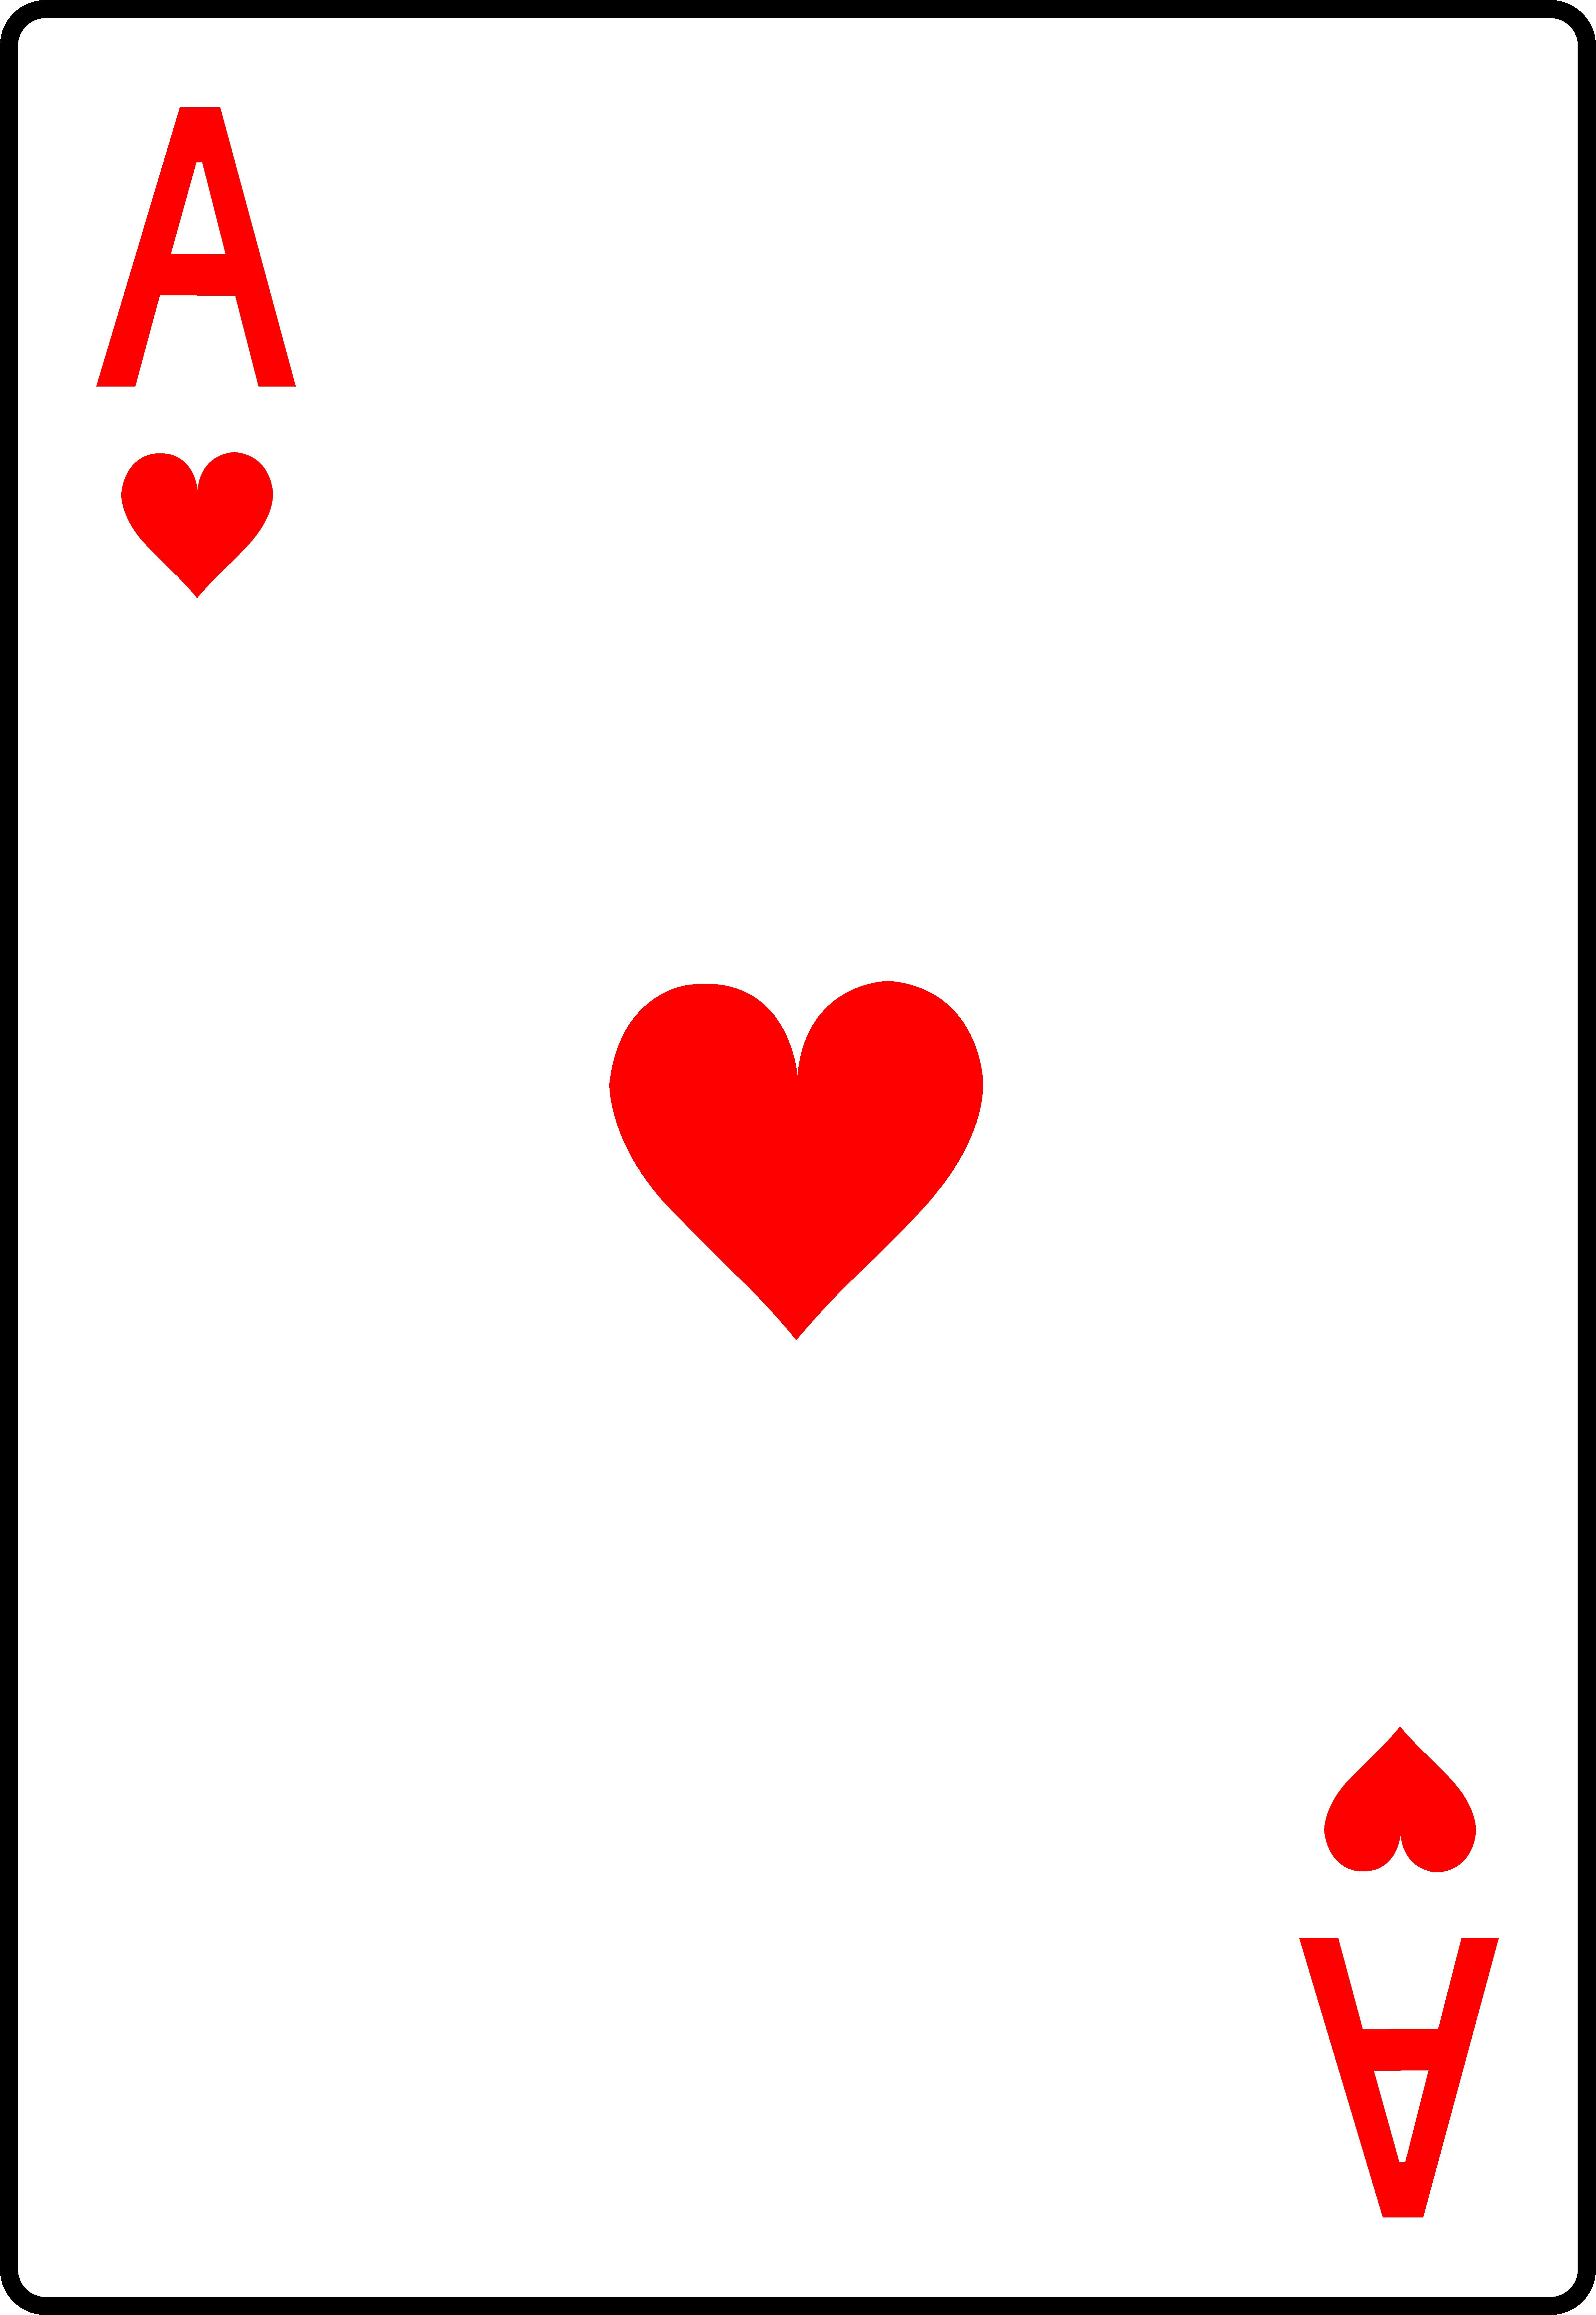 Play Hearts Free Play Hearts Online On Any Device